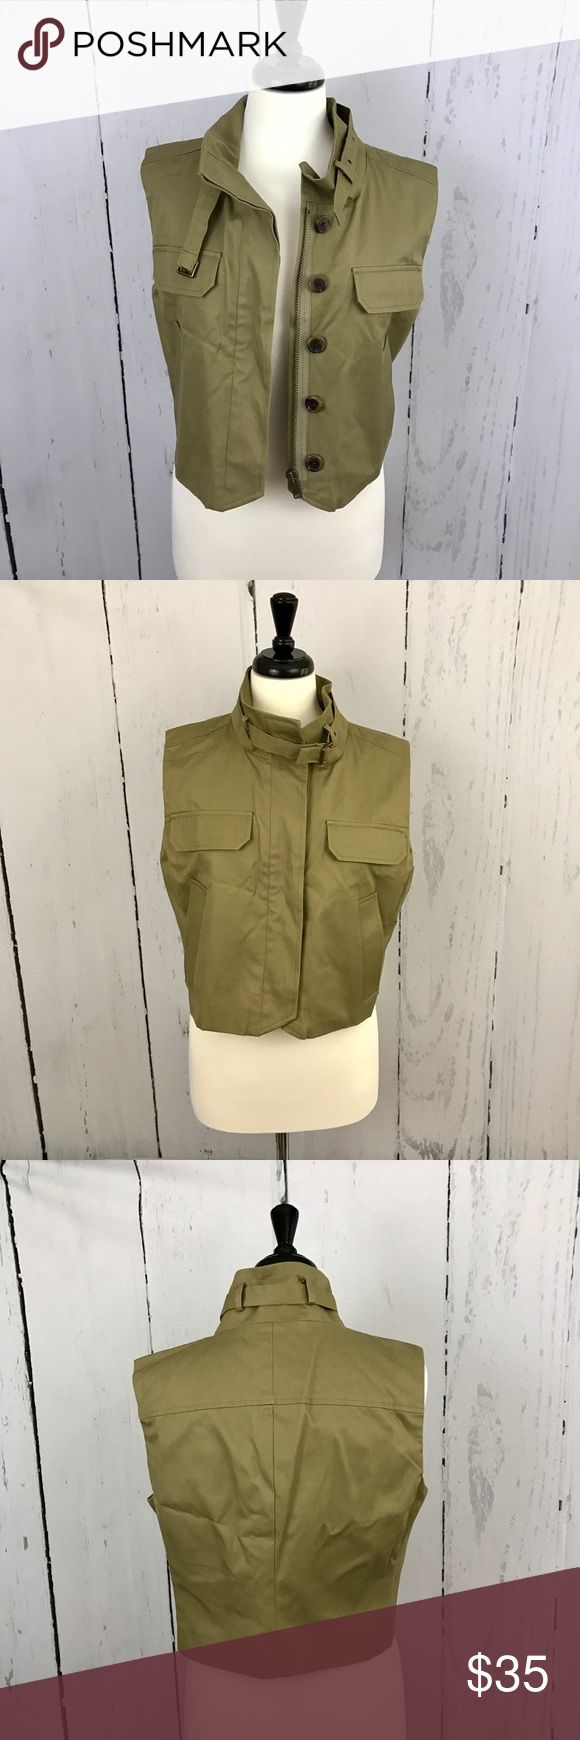 J. Crew Cotton Vest Trench coat-like details. Olive cotton material. Great outfit maker over a plain tee. EUC J. Crew Jackets & Coats Vests